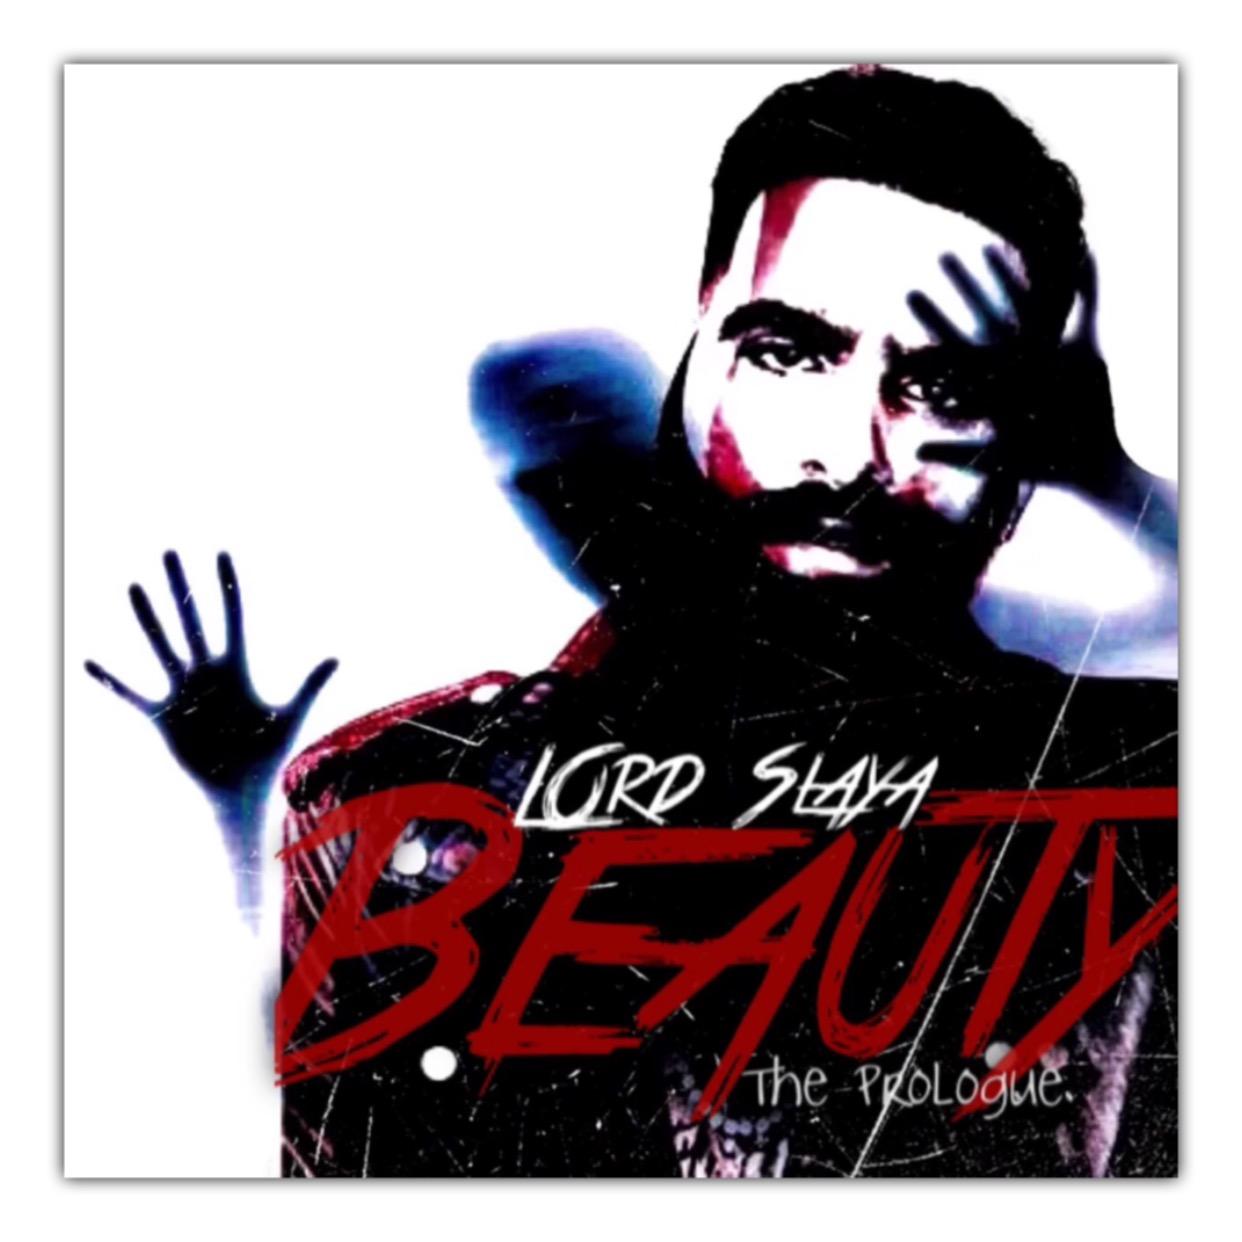 Lord Slaya - The Beauty Of Death